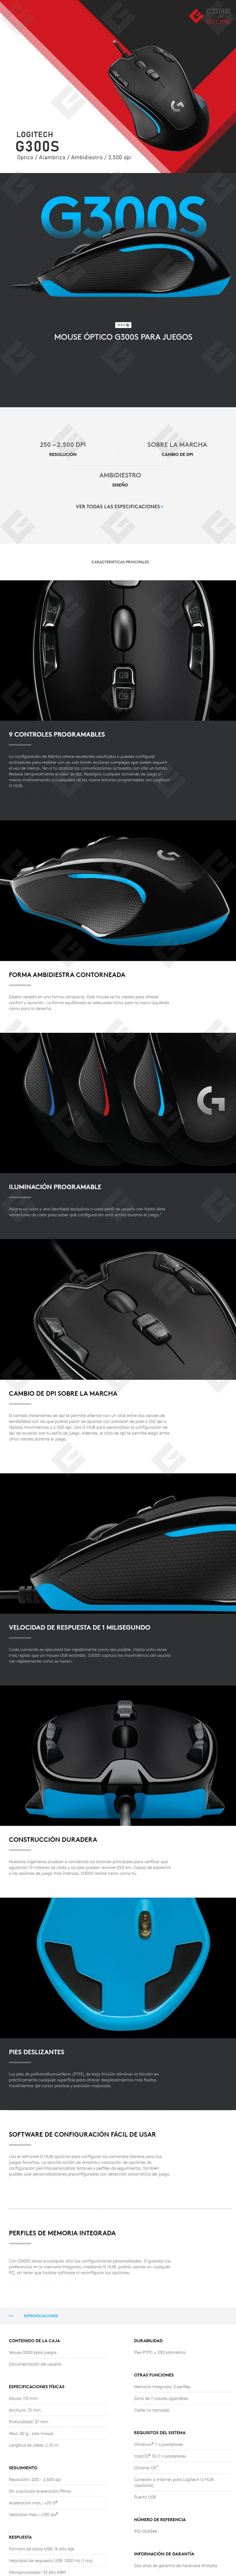 Mouse Logitech G300S Optical Gaming , Alámbrico, 9 Botones programable, Ambidiestro  2,500 DPI - 910-004344